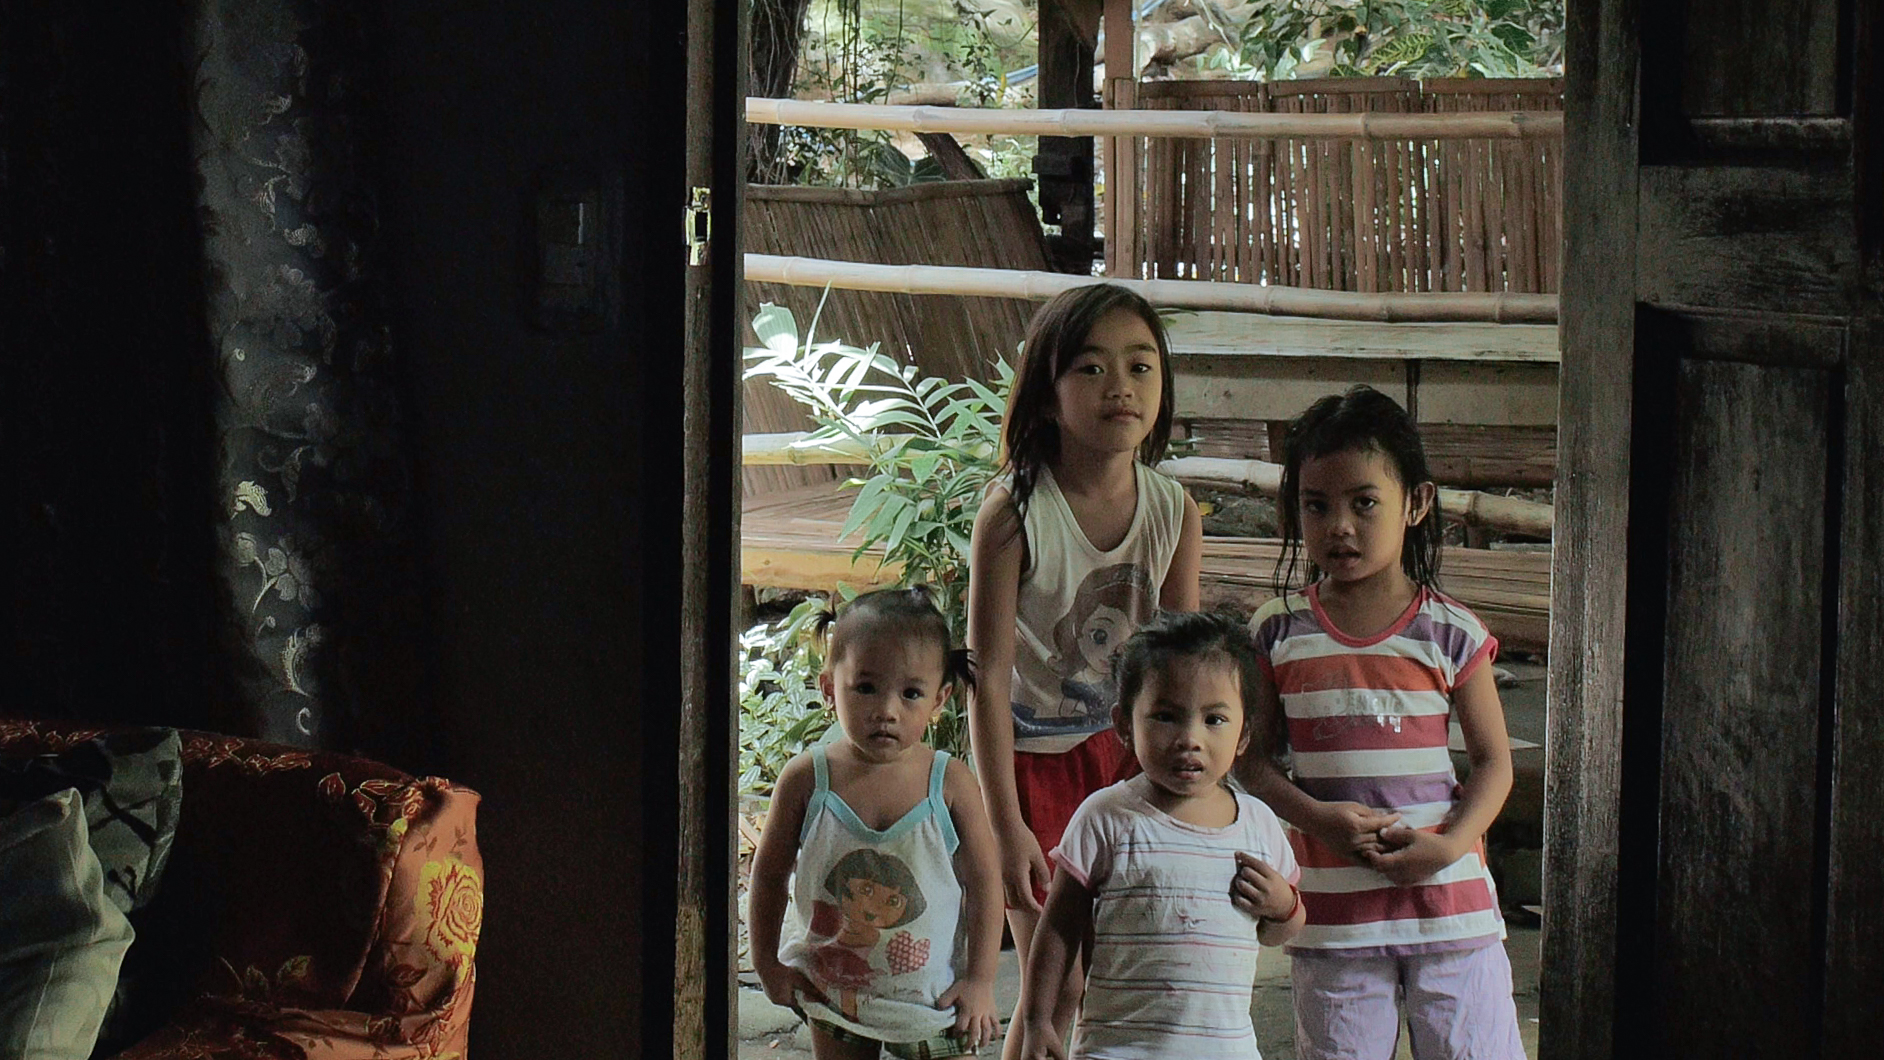 Martika Ramirez Escobar | Philippines | 2017 | Filipino | 16 mins  A meta-documentary of a former Overseas Filipino Worker in his home in Manila.